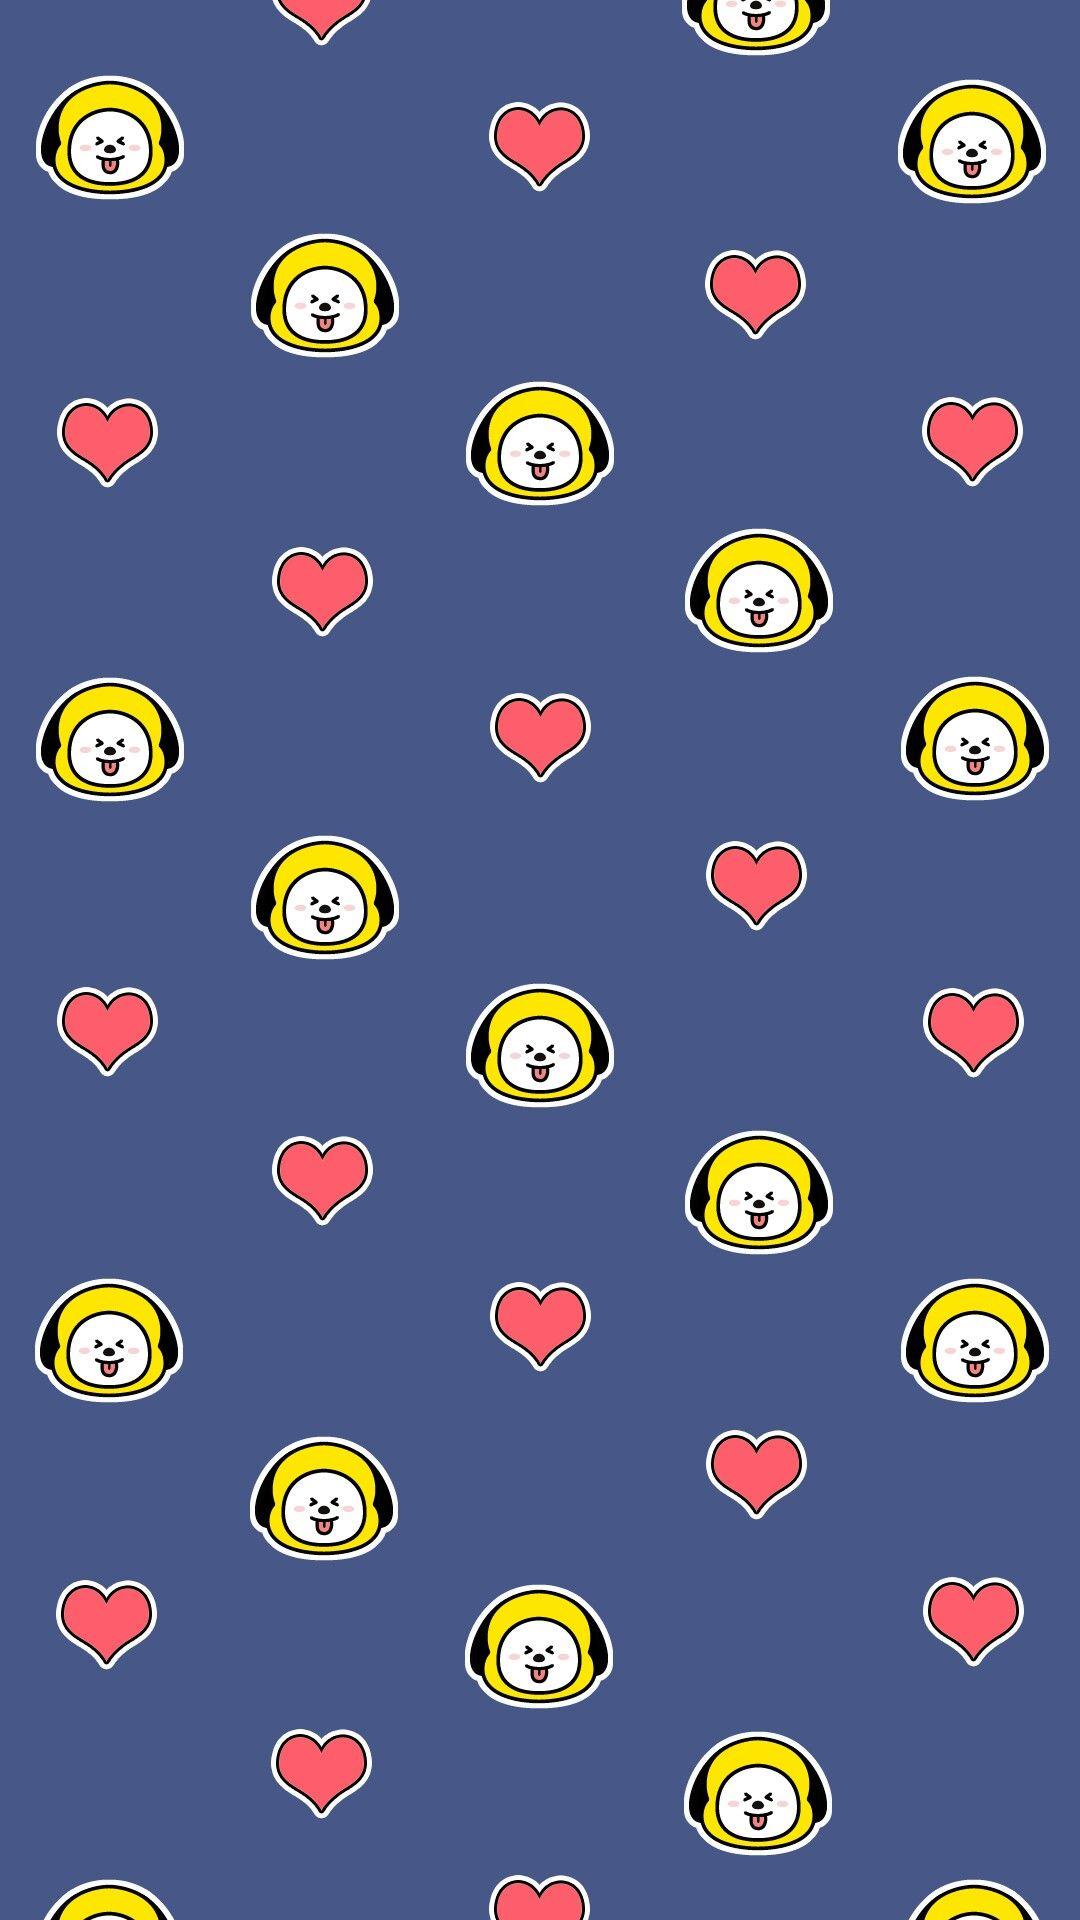 bt21 🌟🌙 shooky cooky tata chimmy mang koya Rj